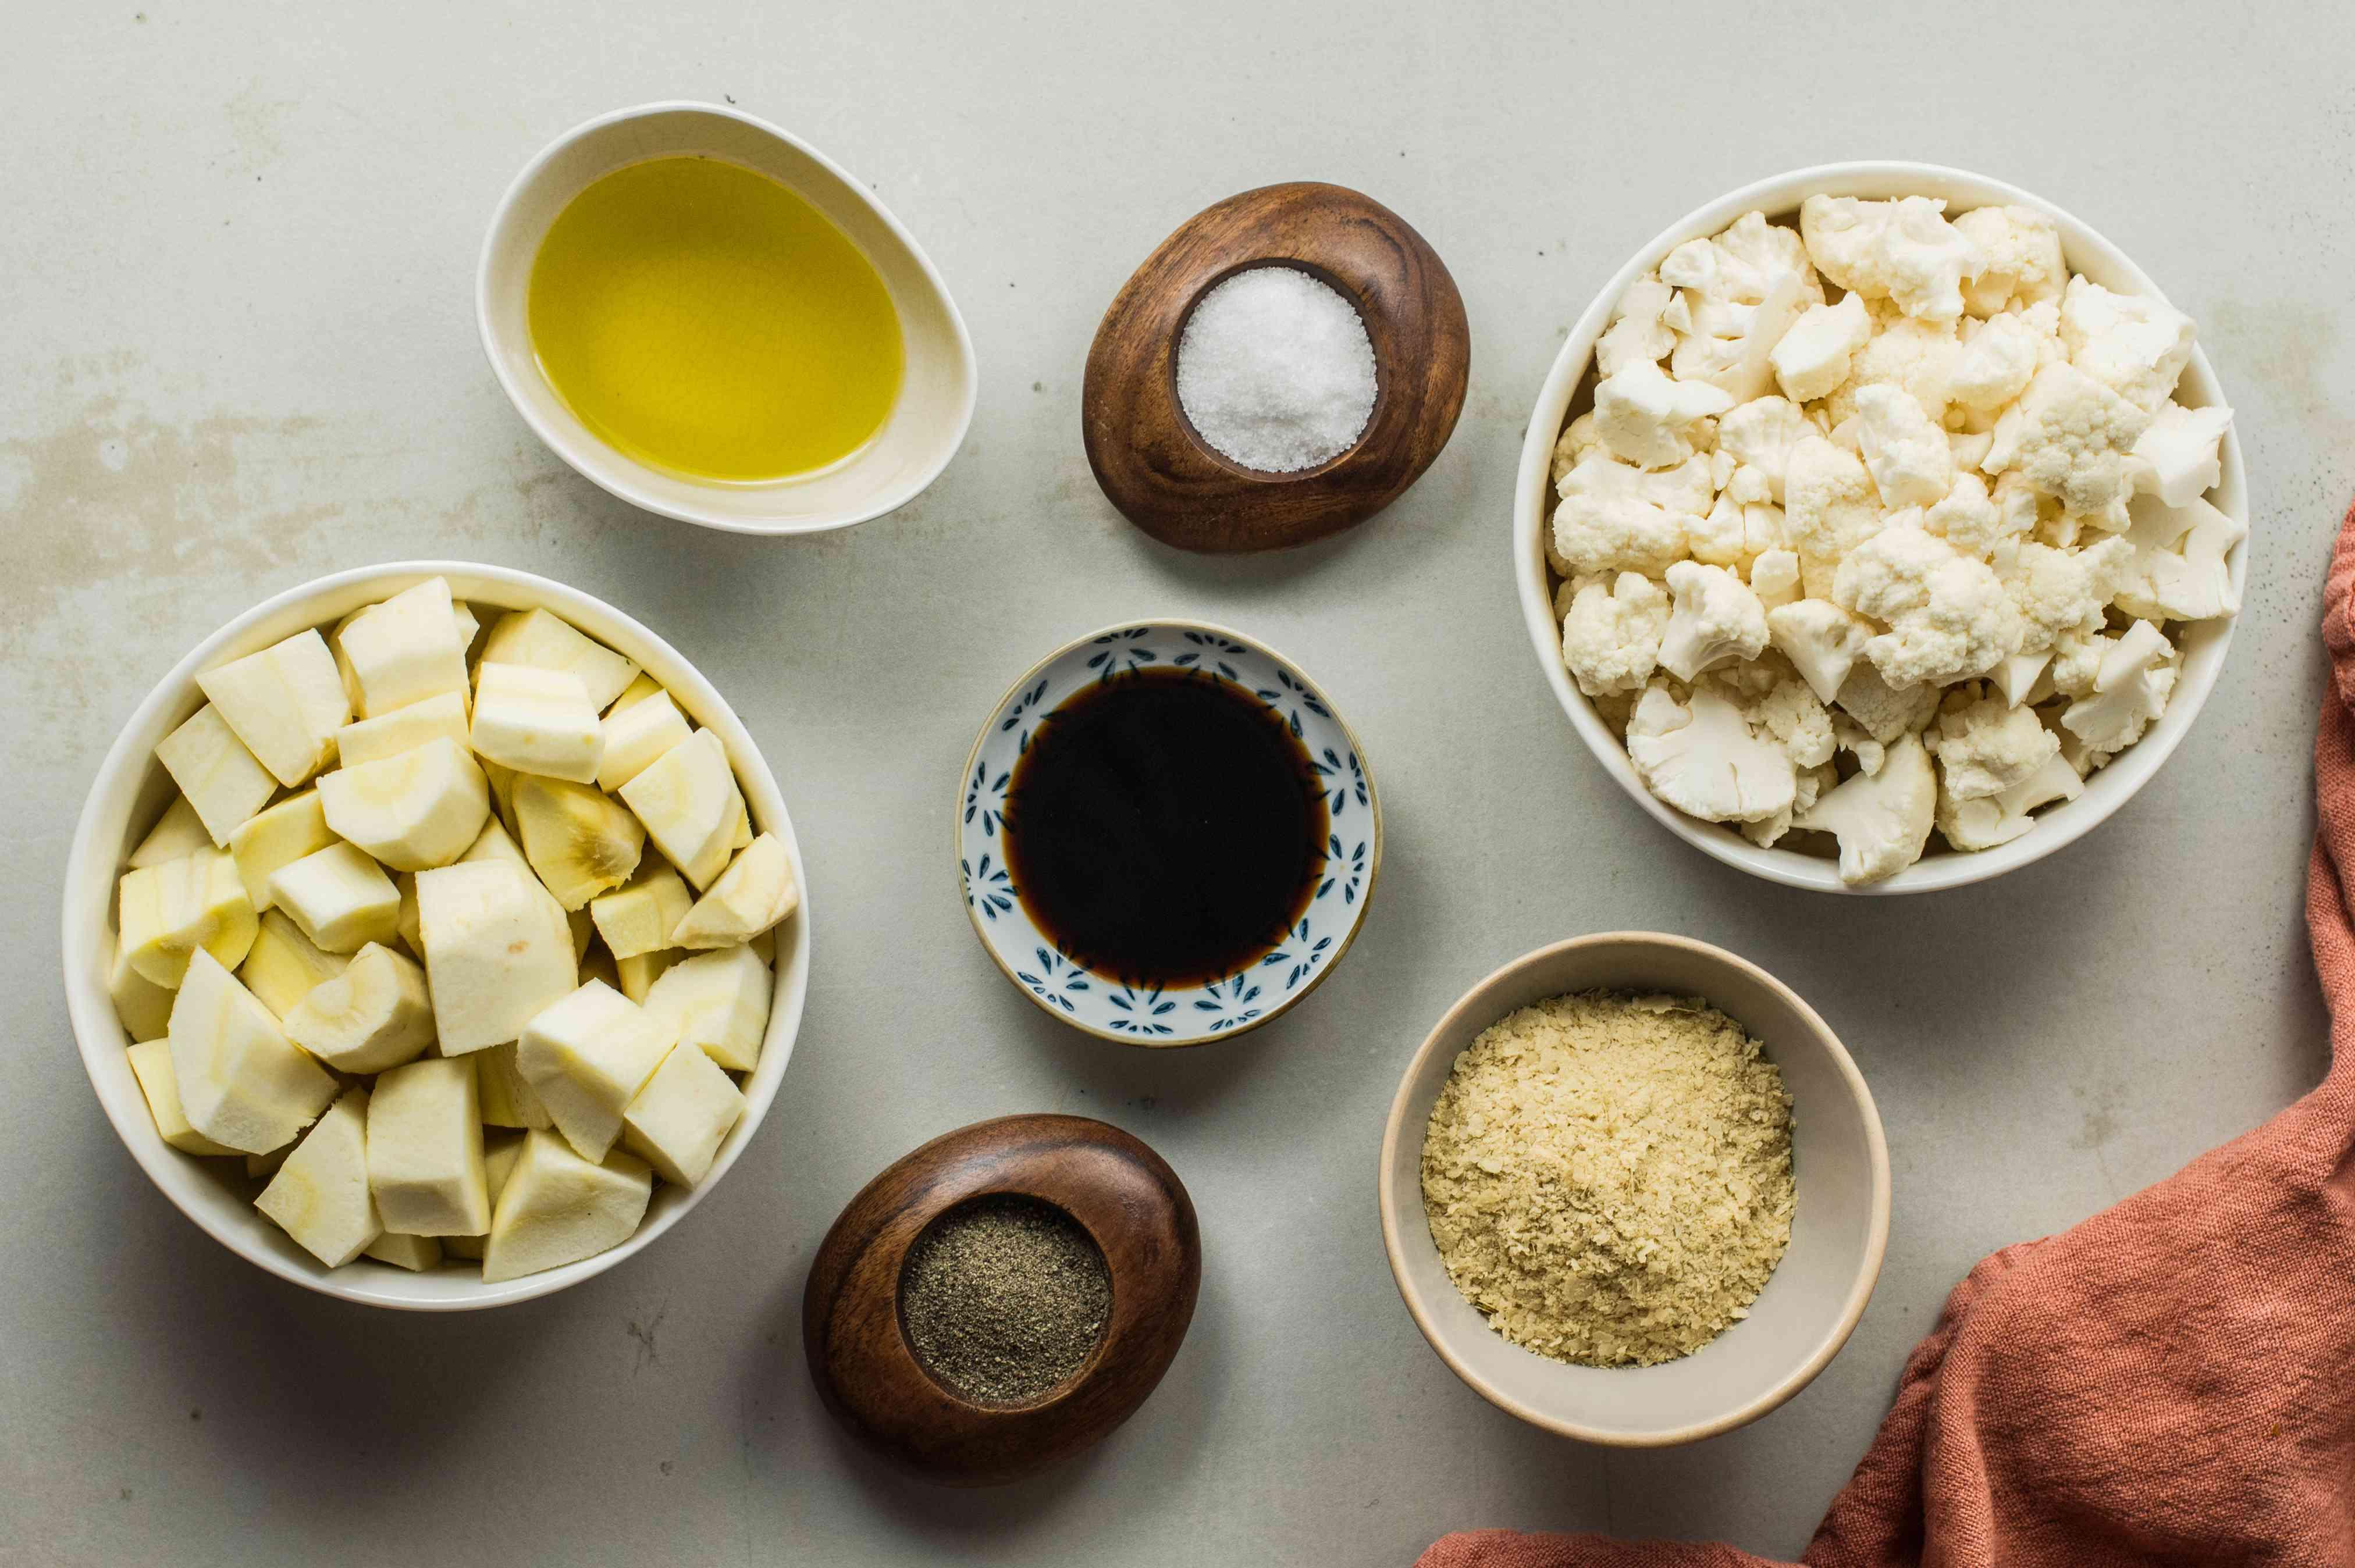 Ingredients for Cauliflower mashed potatoes